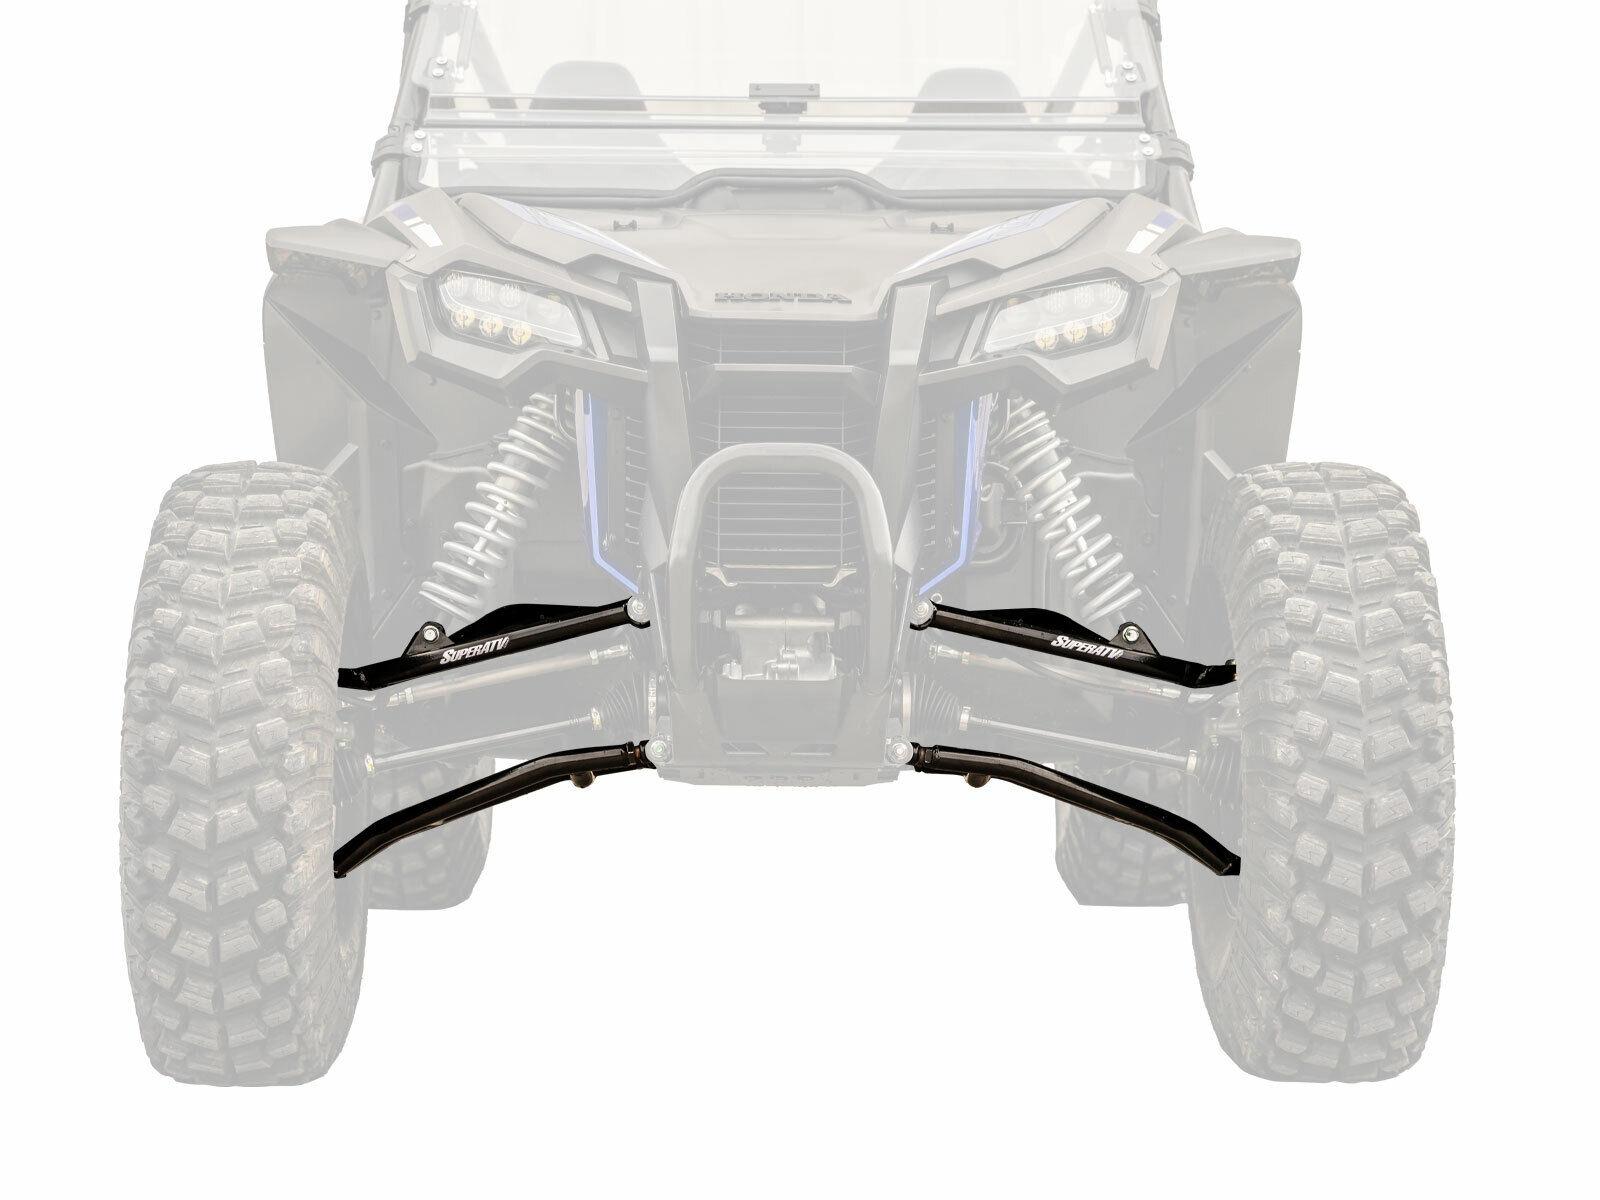 "SuperATV Honda Talon 1000X 1.5"" Forward Offset High Clearance A-Arms - Black"